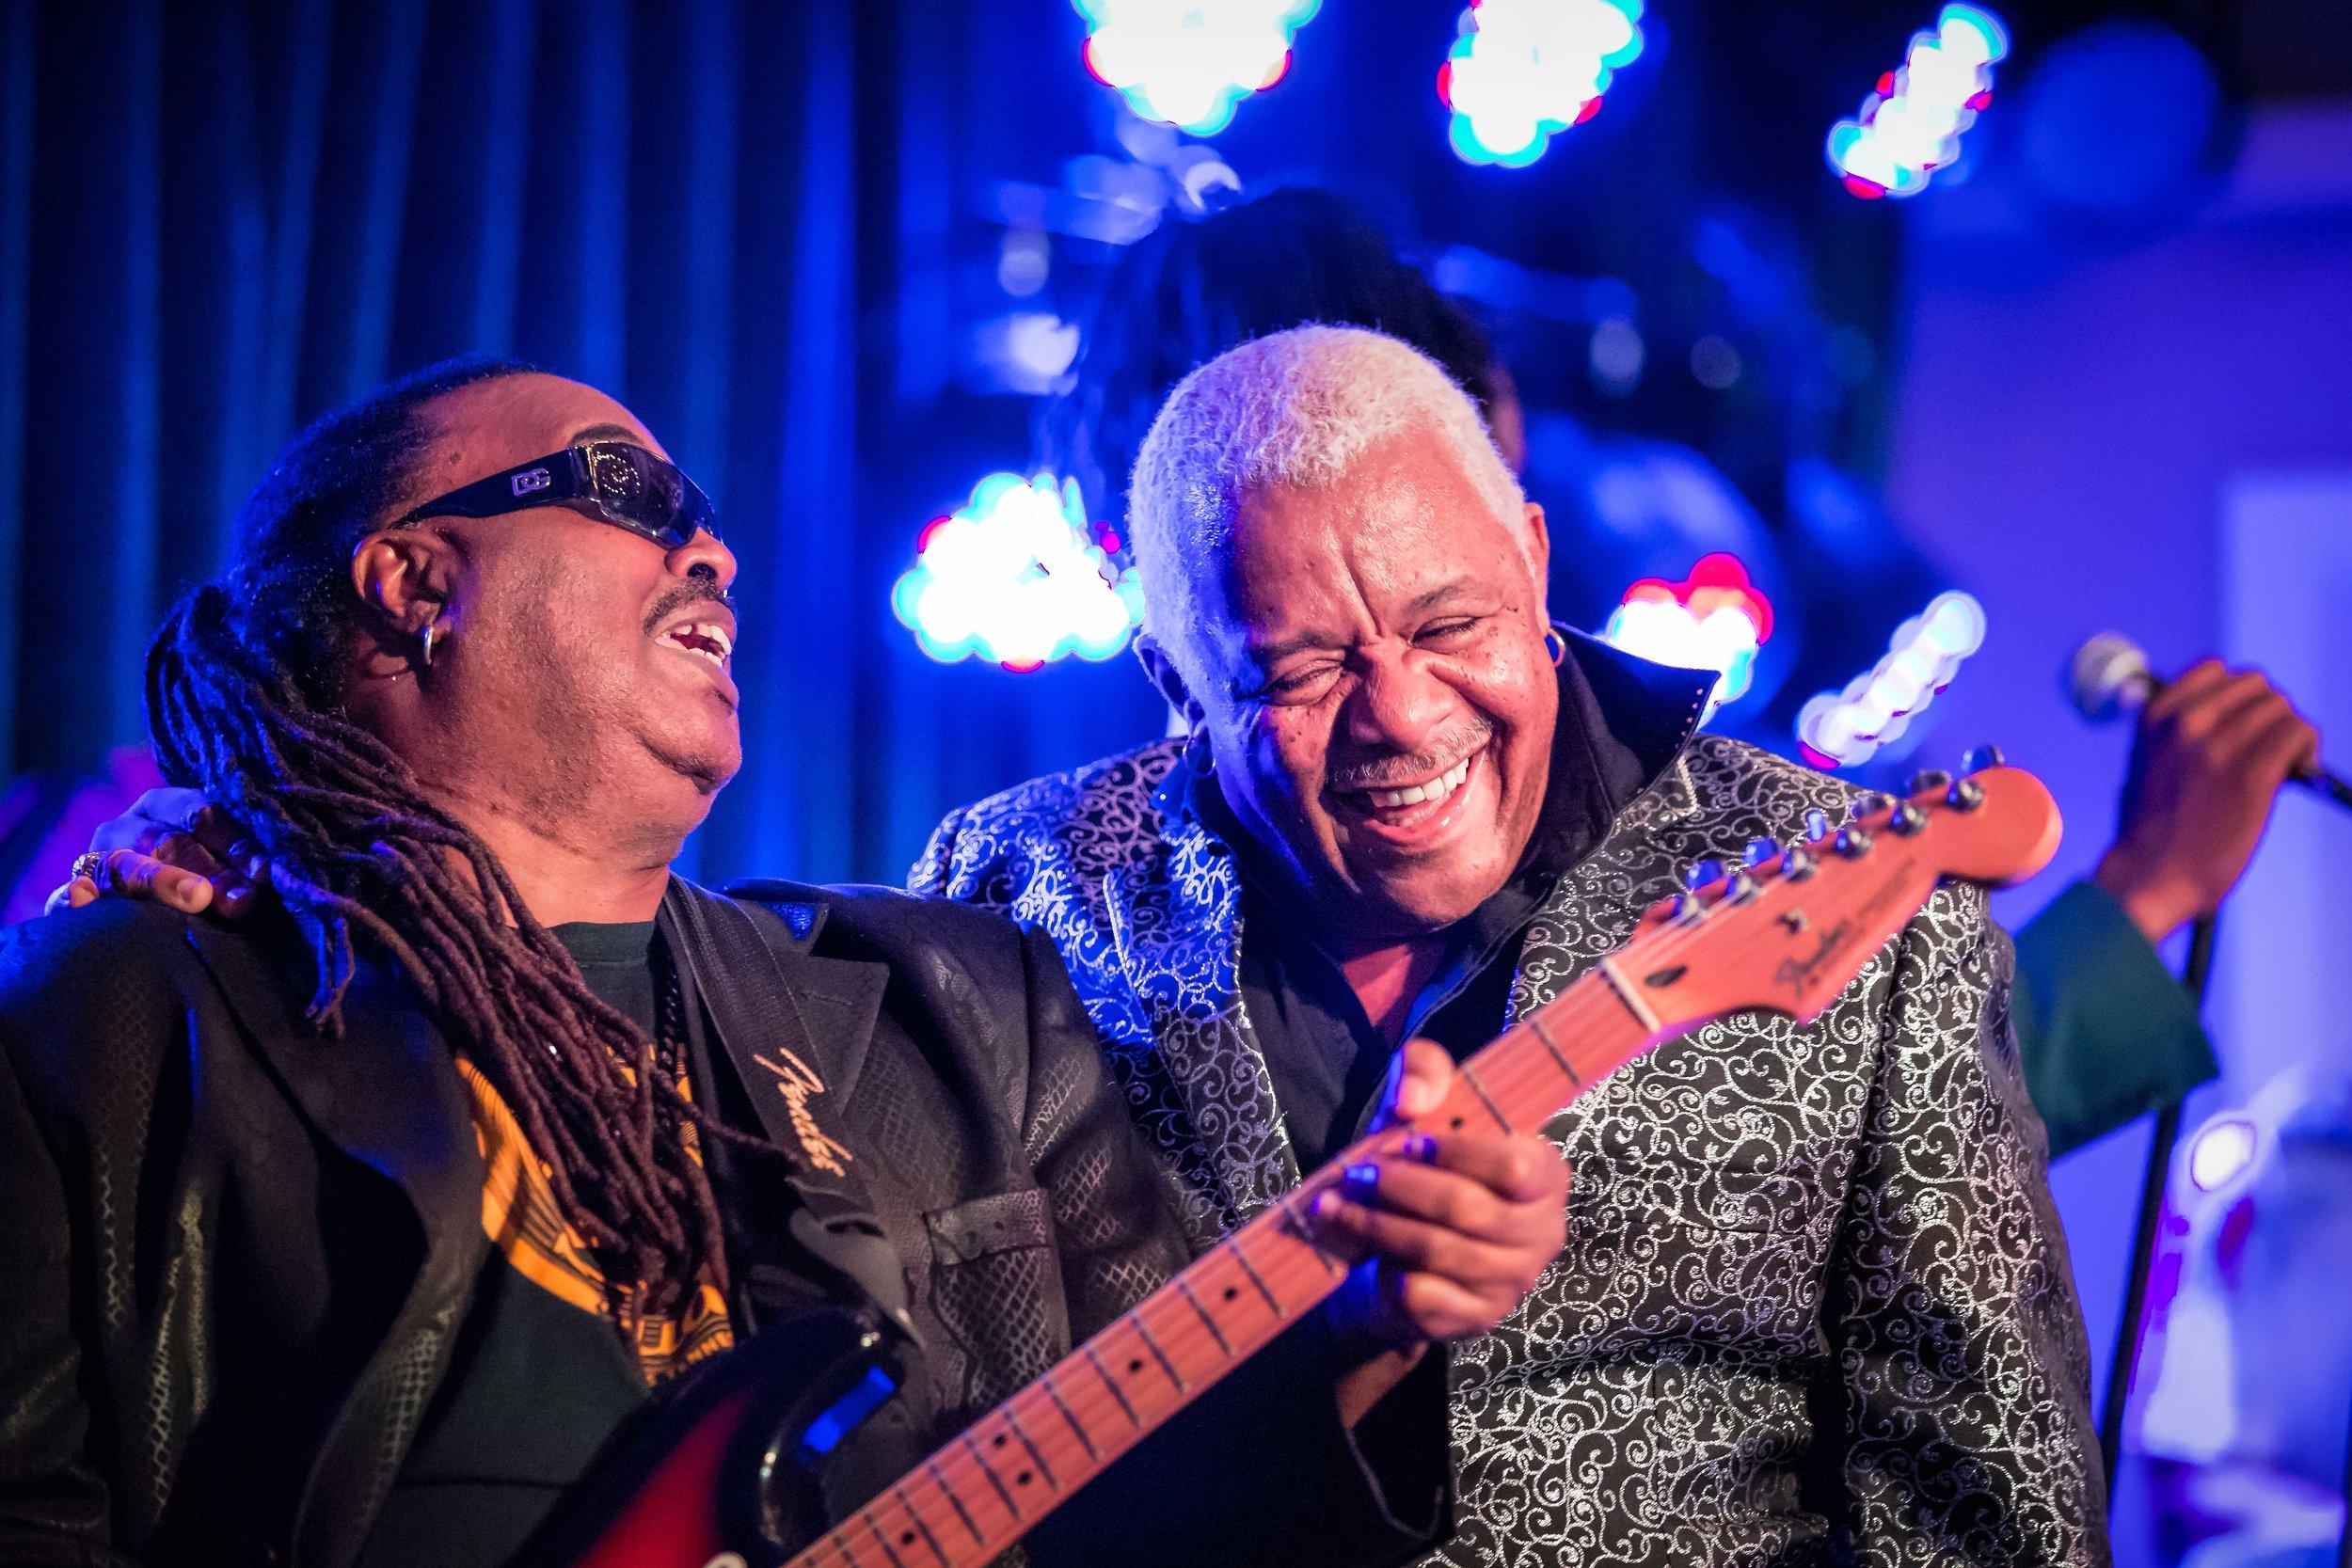 BarKays-Hard-Rock-Cafe-Memphis-1.jpg